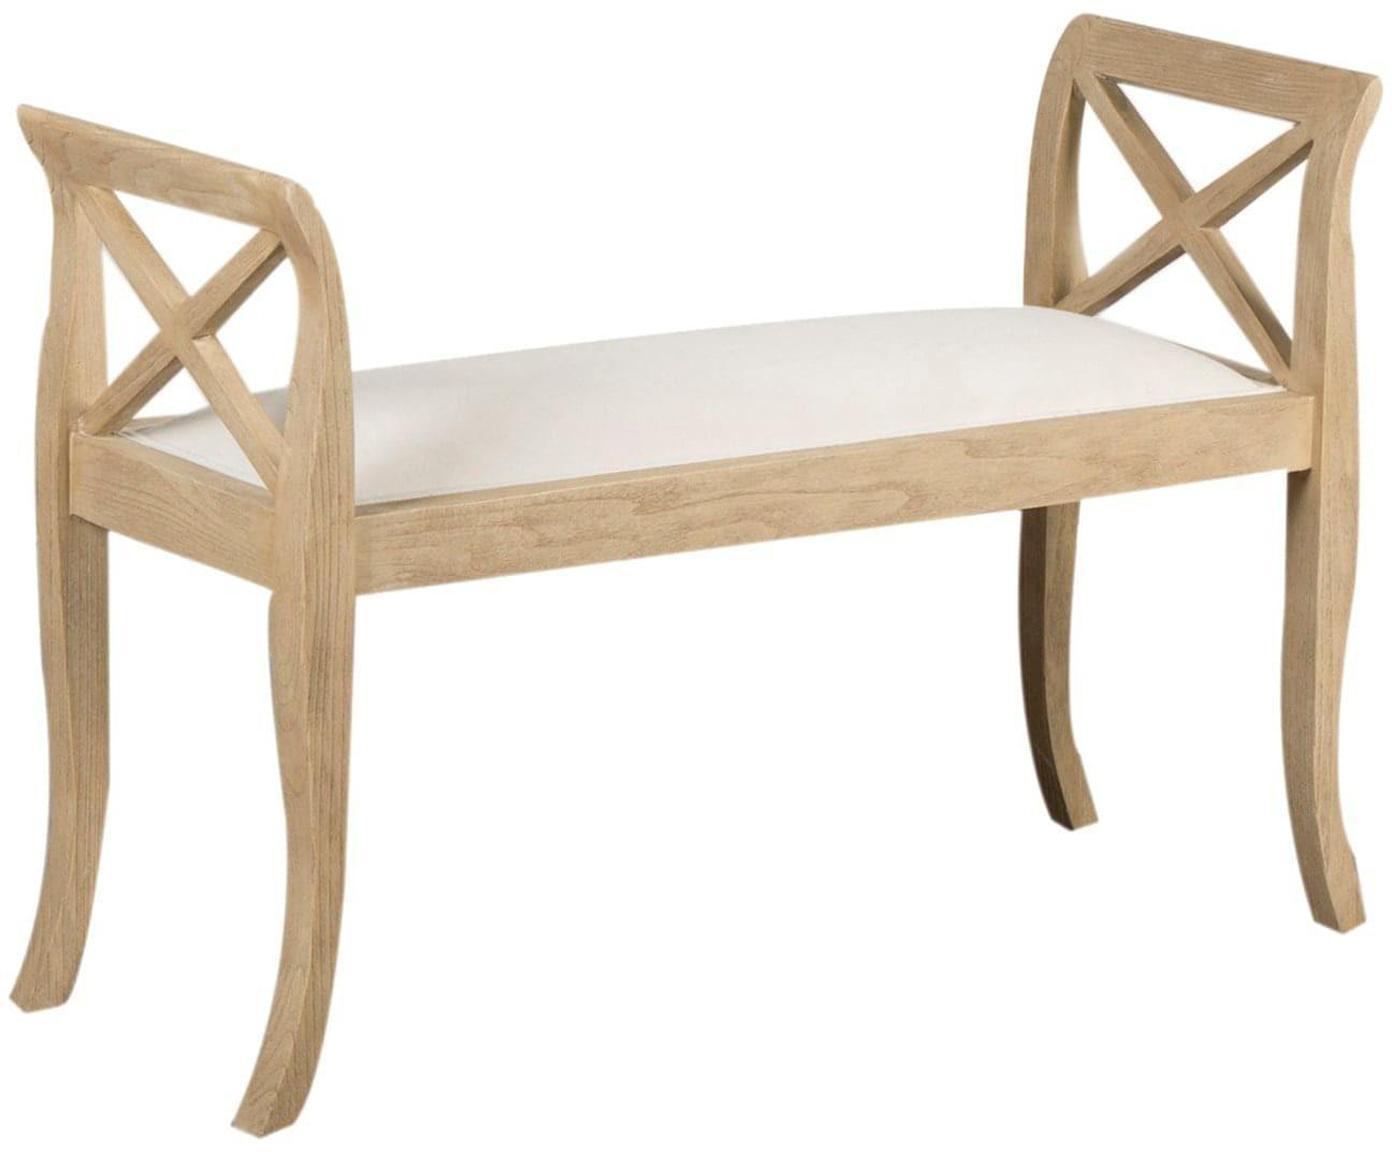 Banco Colony, Tapizado: algodón, Estructura: madera de roble pintada, Blanco, beige, An 92 x Al 64 cm